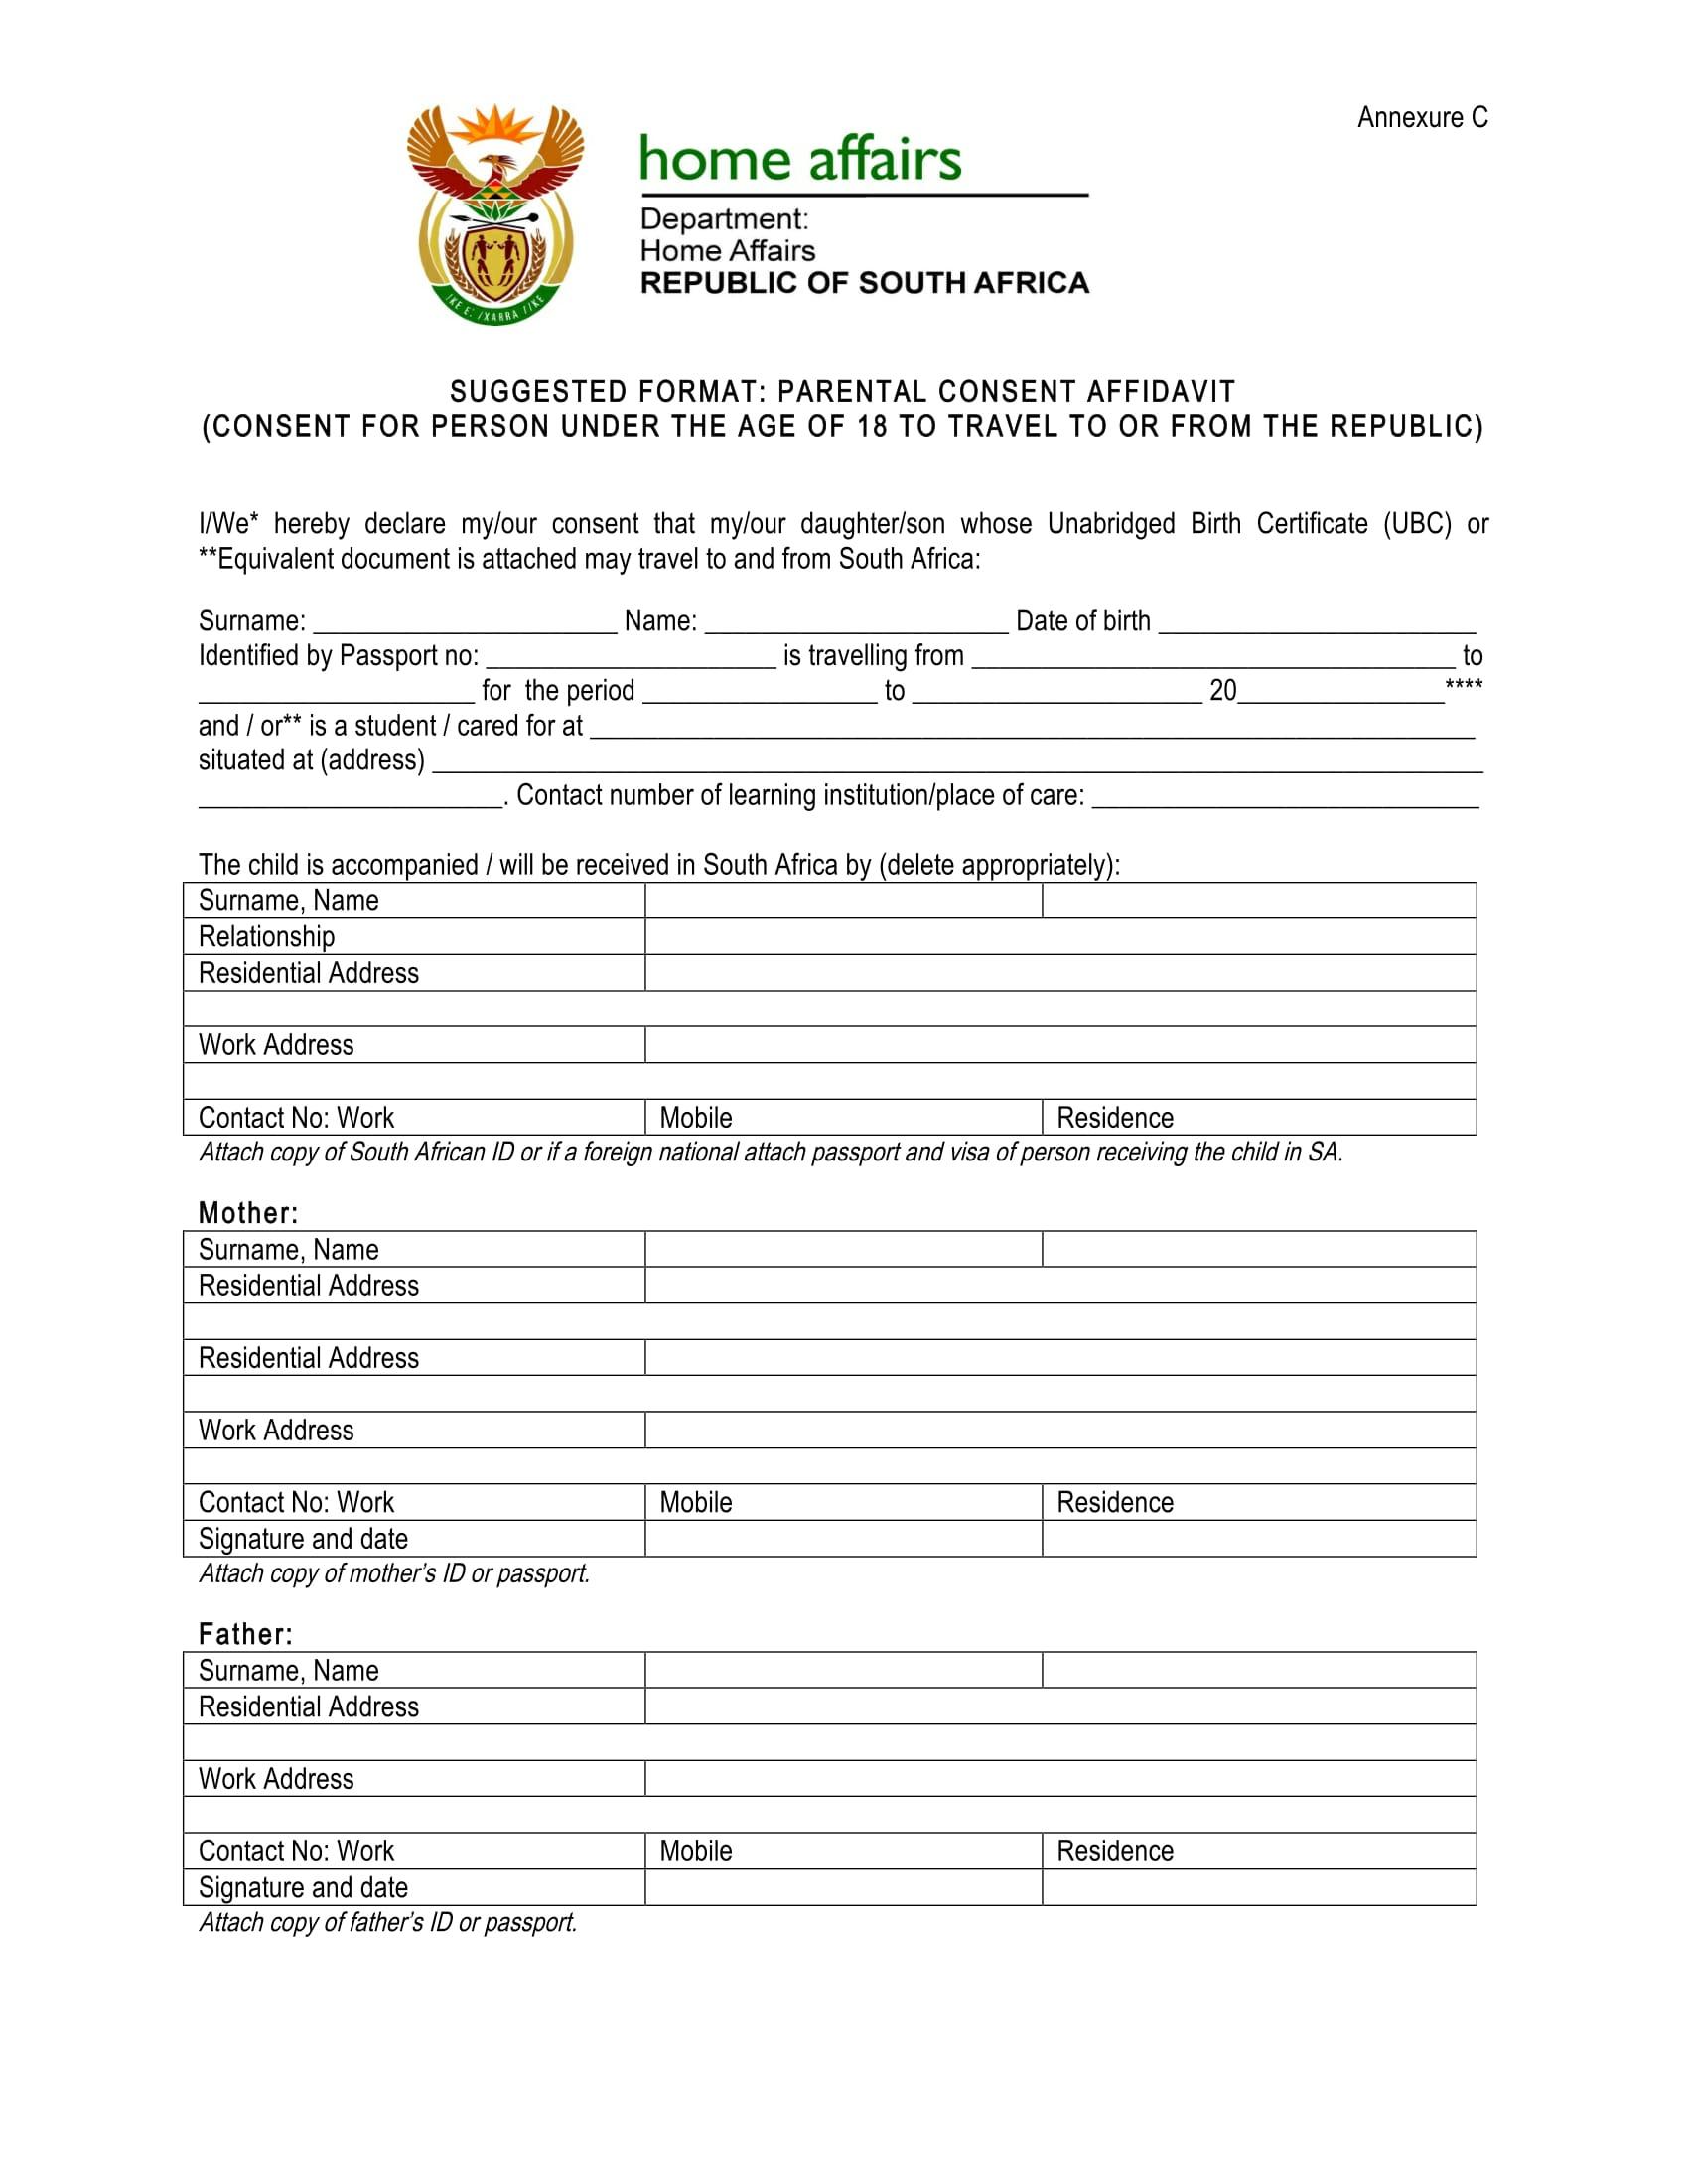 parental consent affidavit format 1